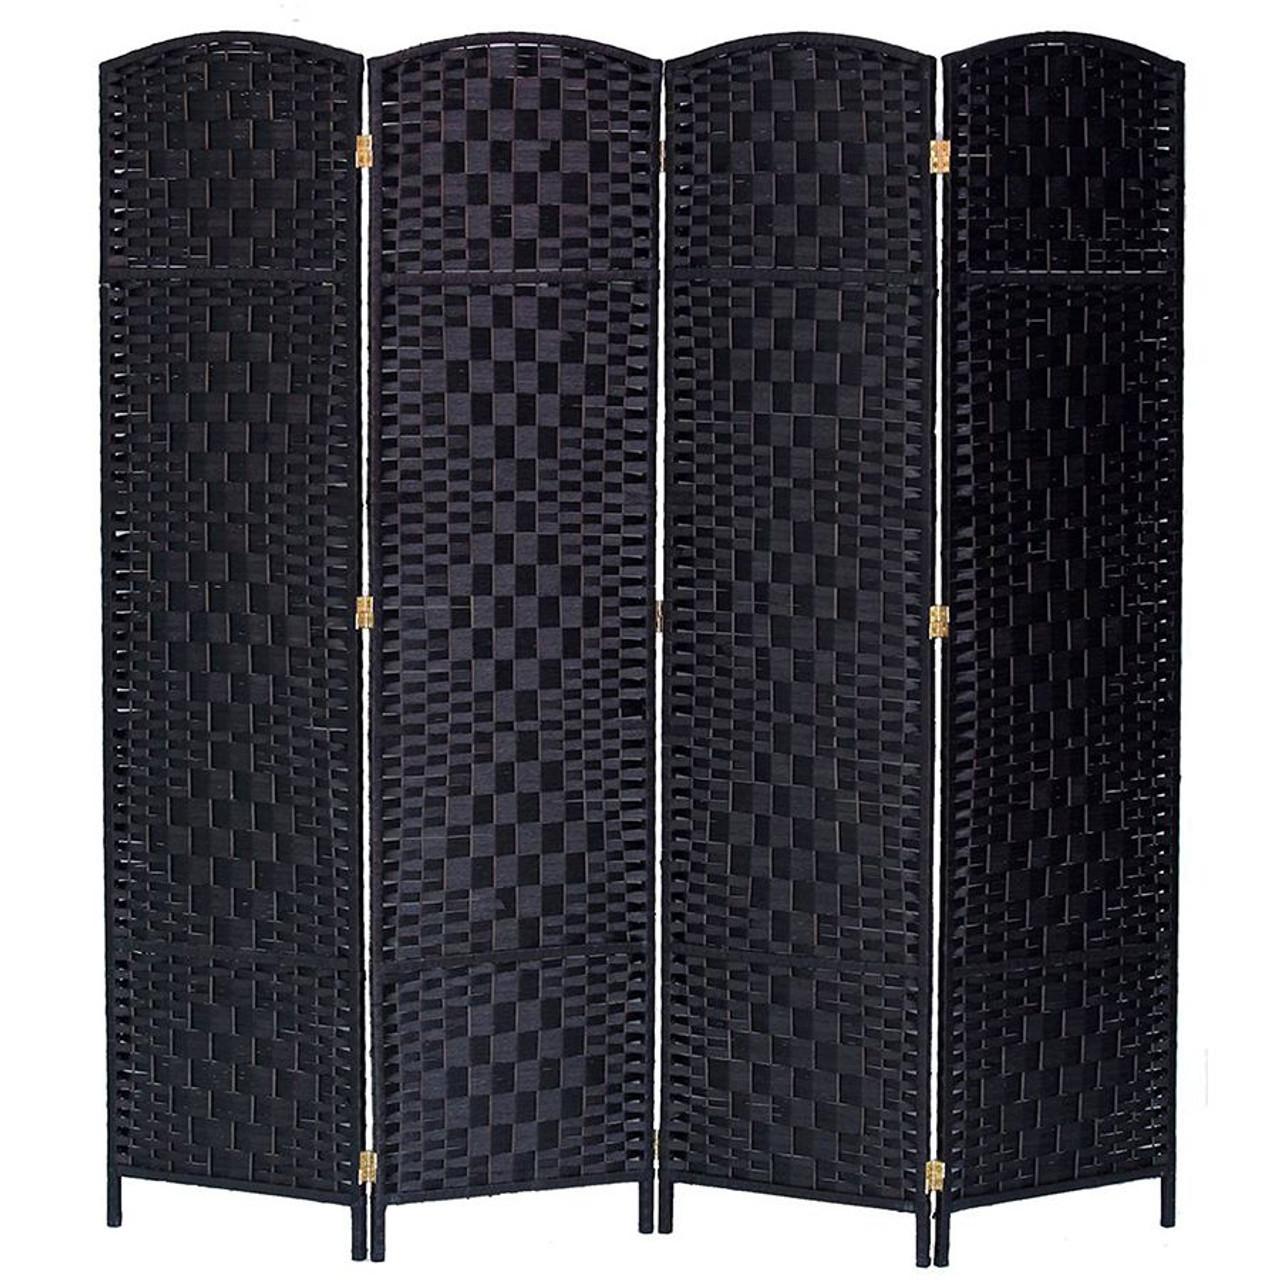 4 Panel Room Divider Privacy Screen Diamond Weave Fiber